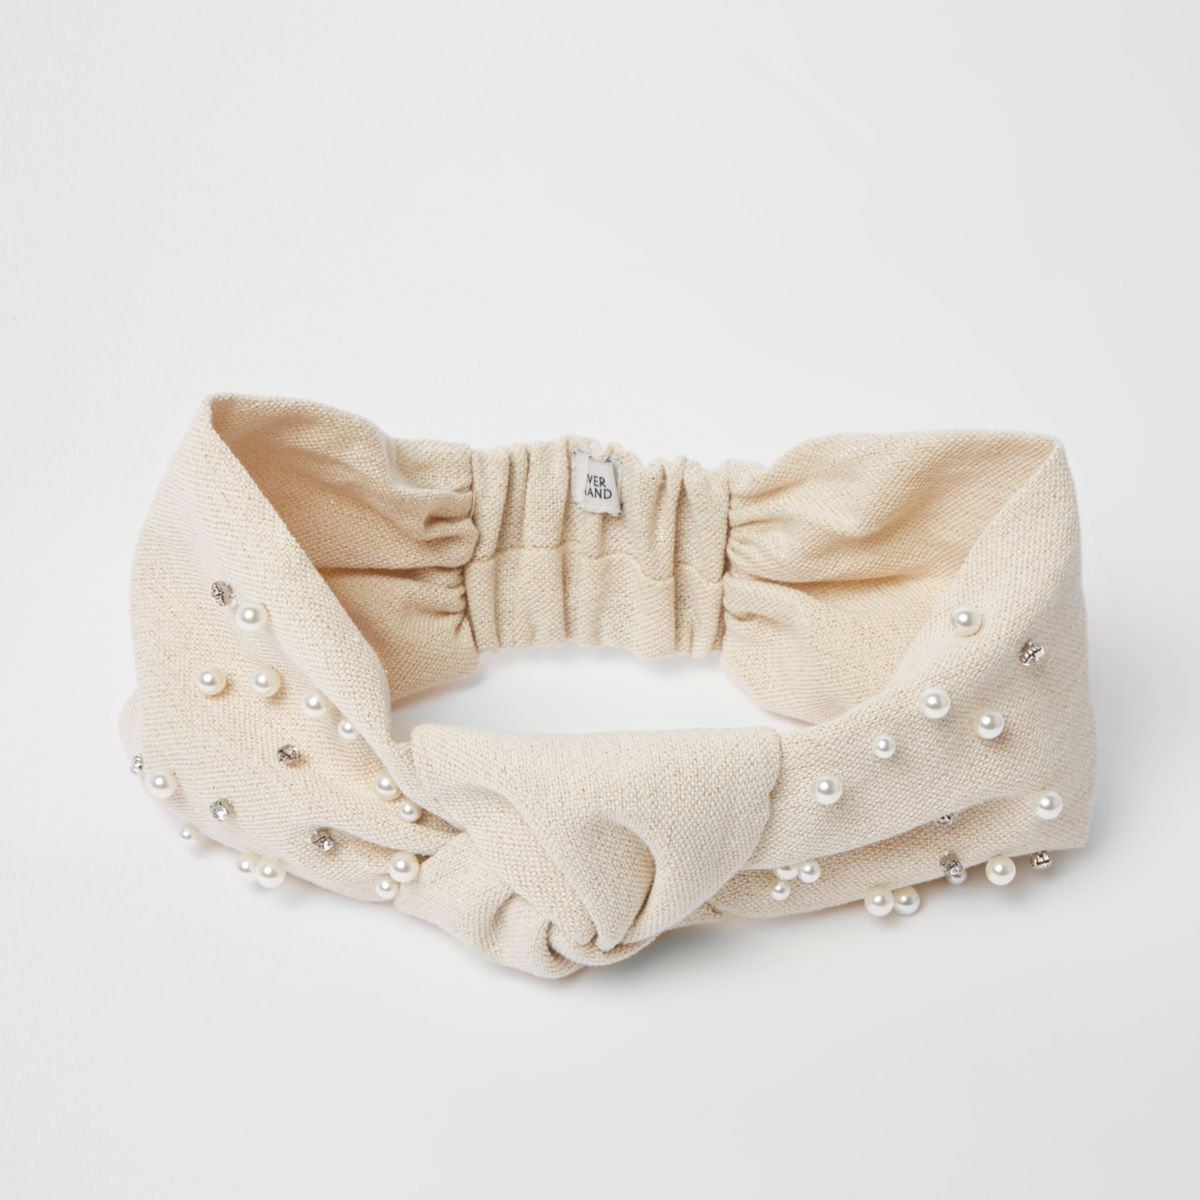 Cream knot front embellished headband